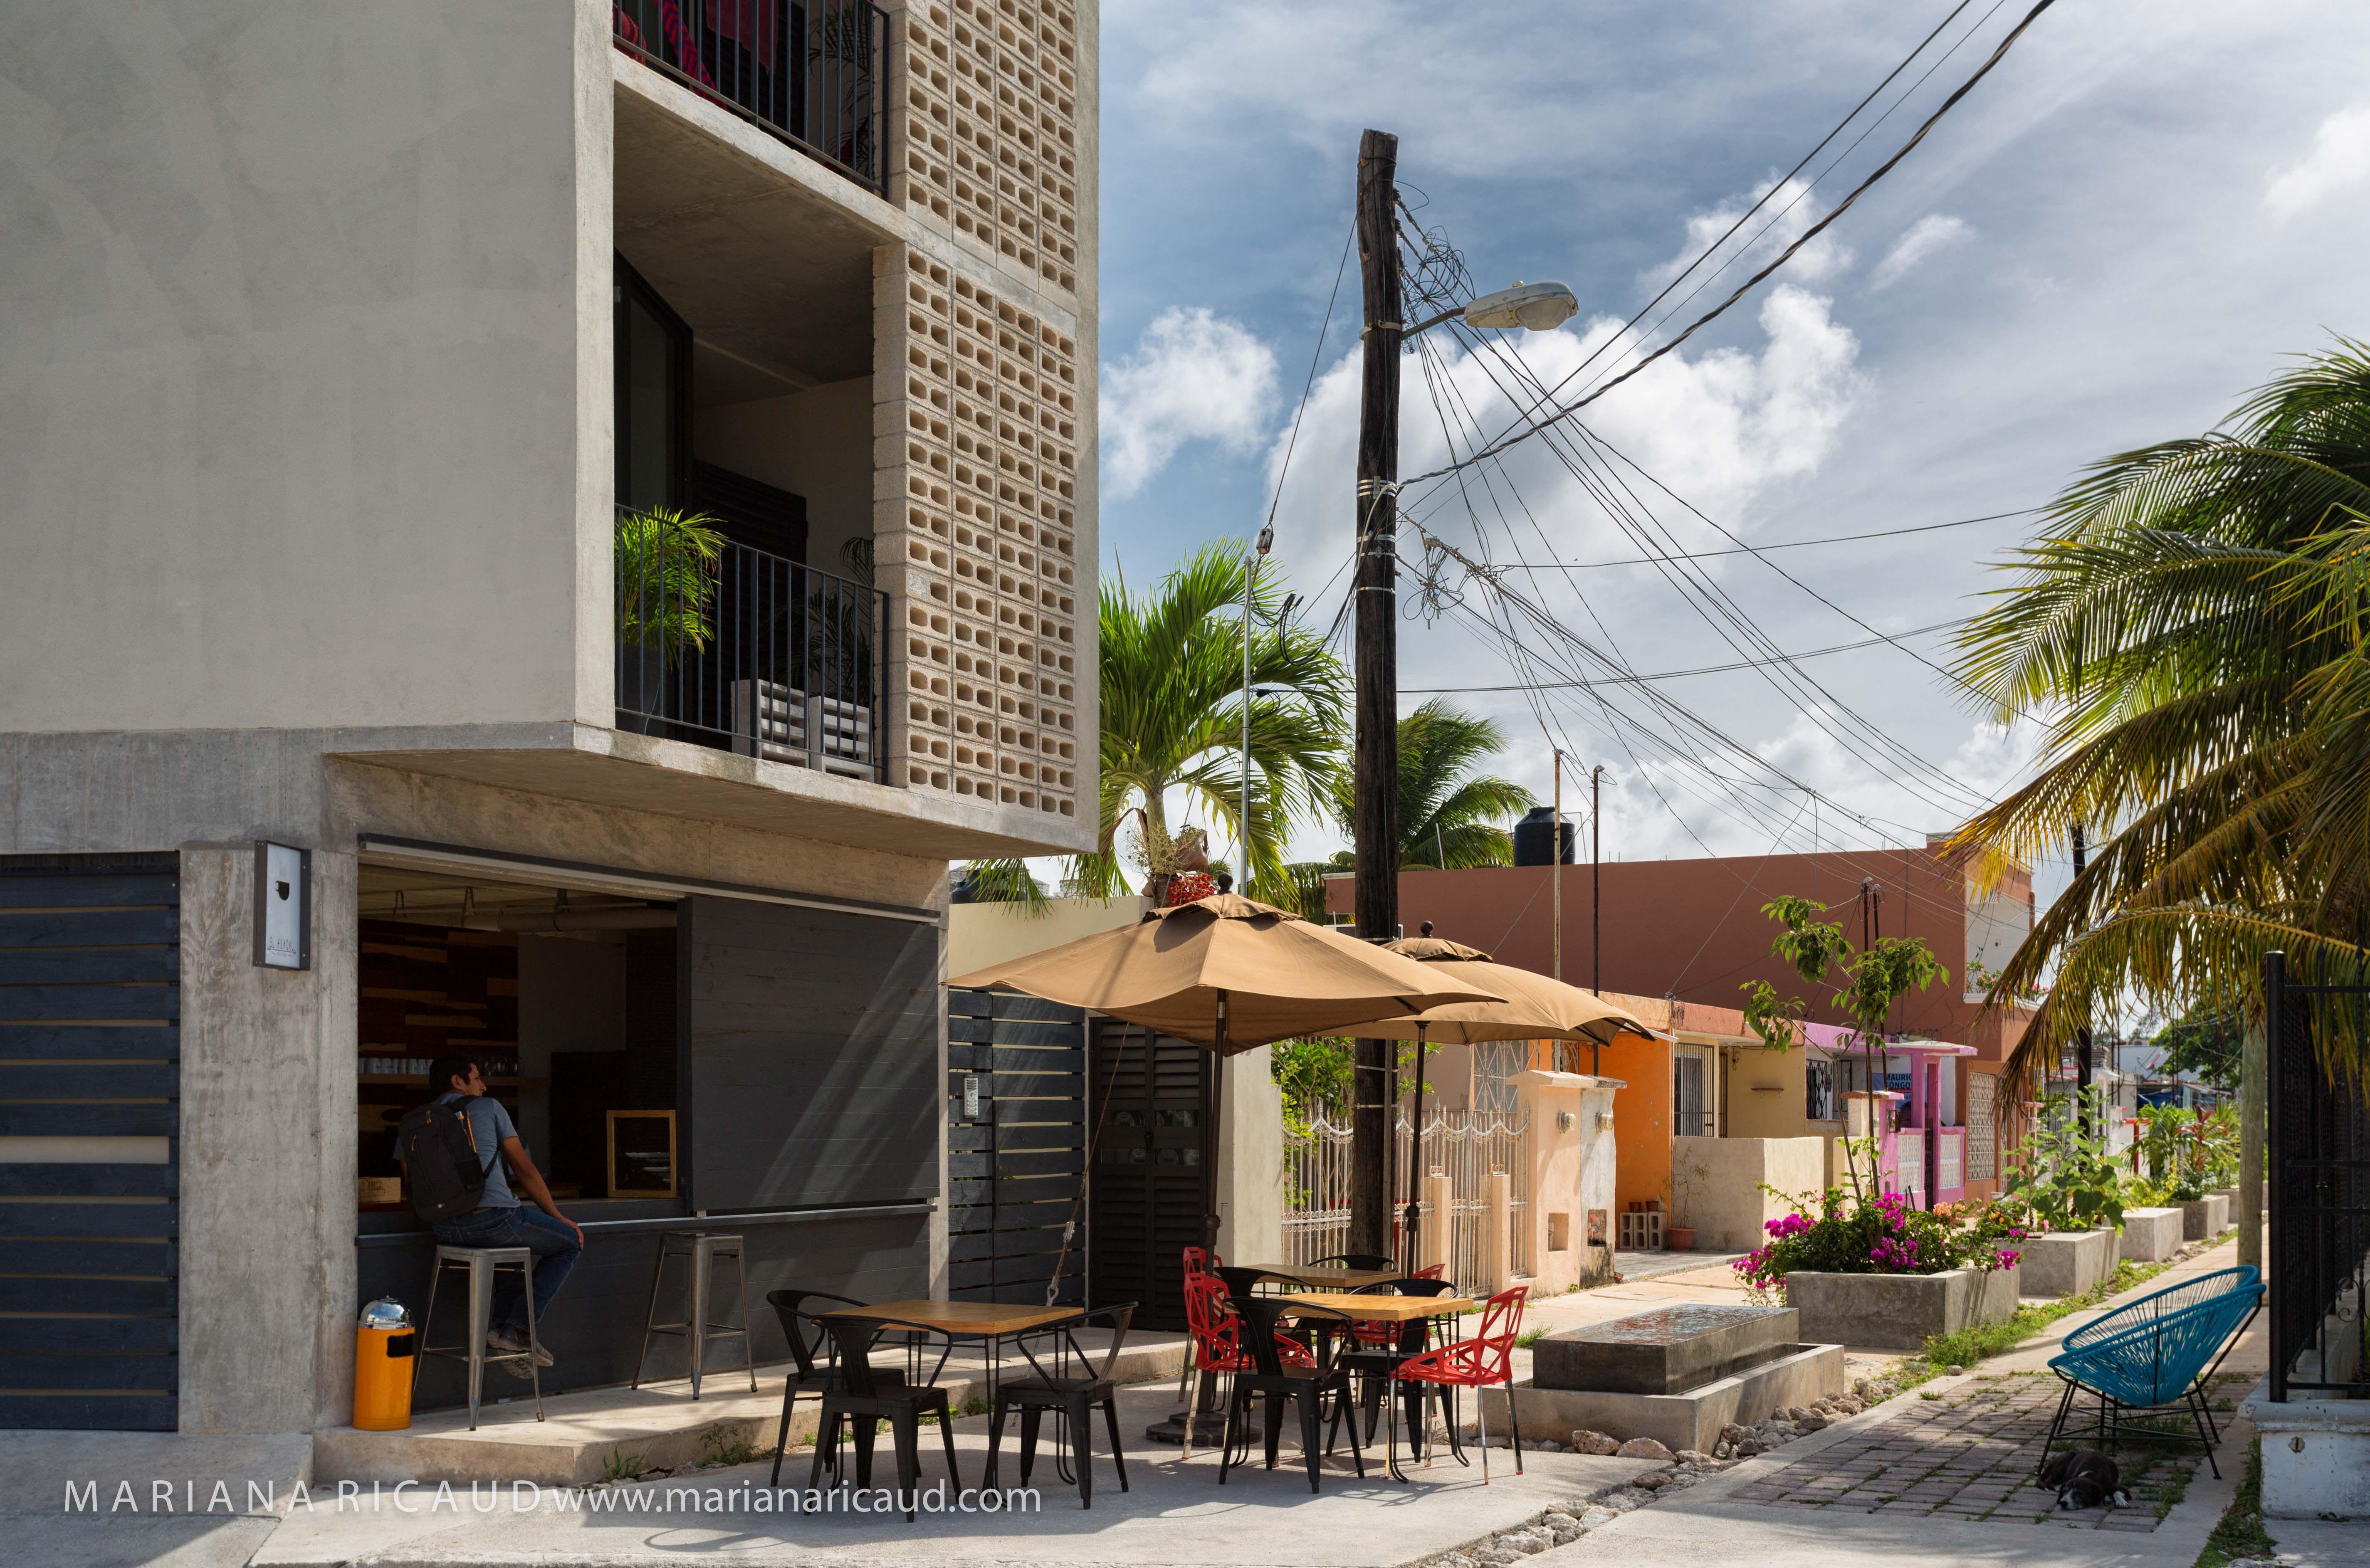 El Huacal pan & café